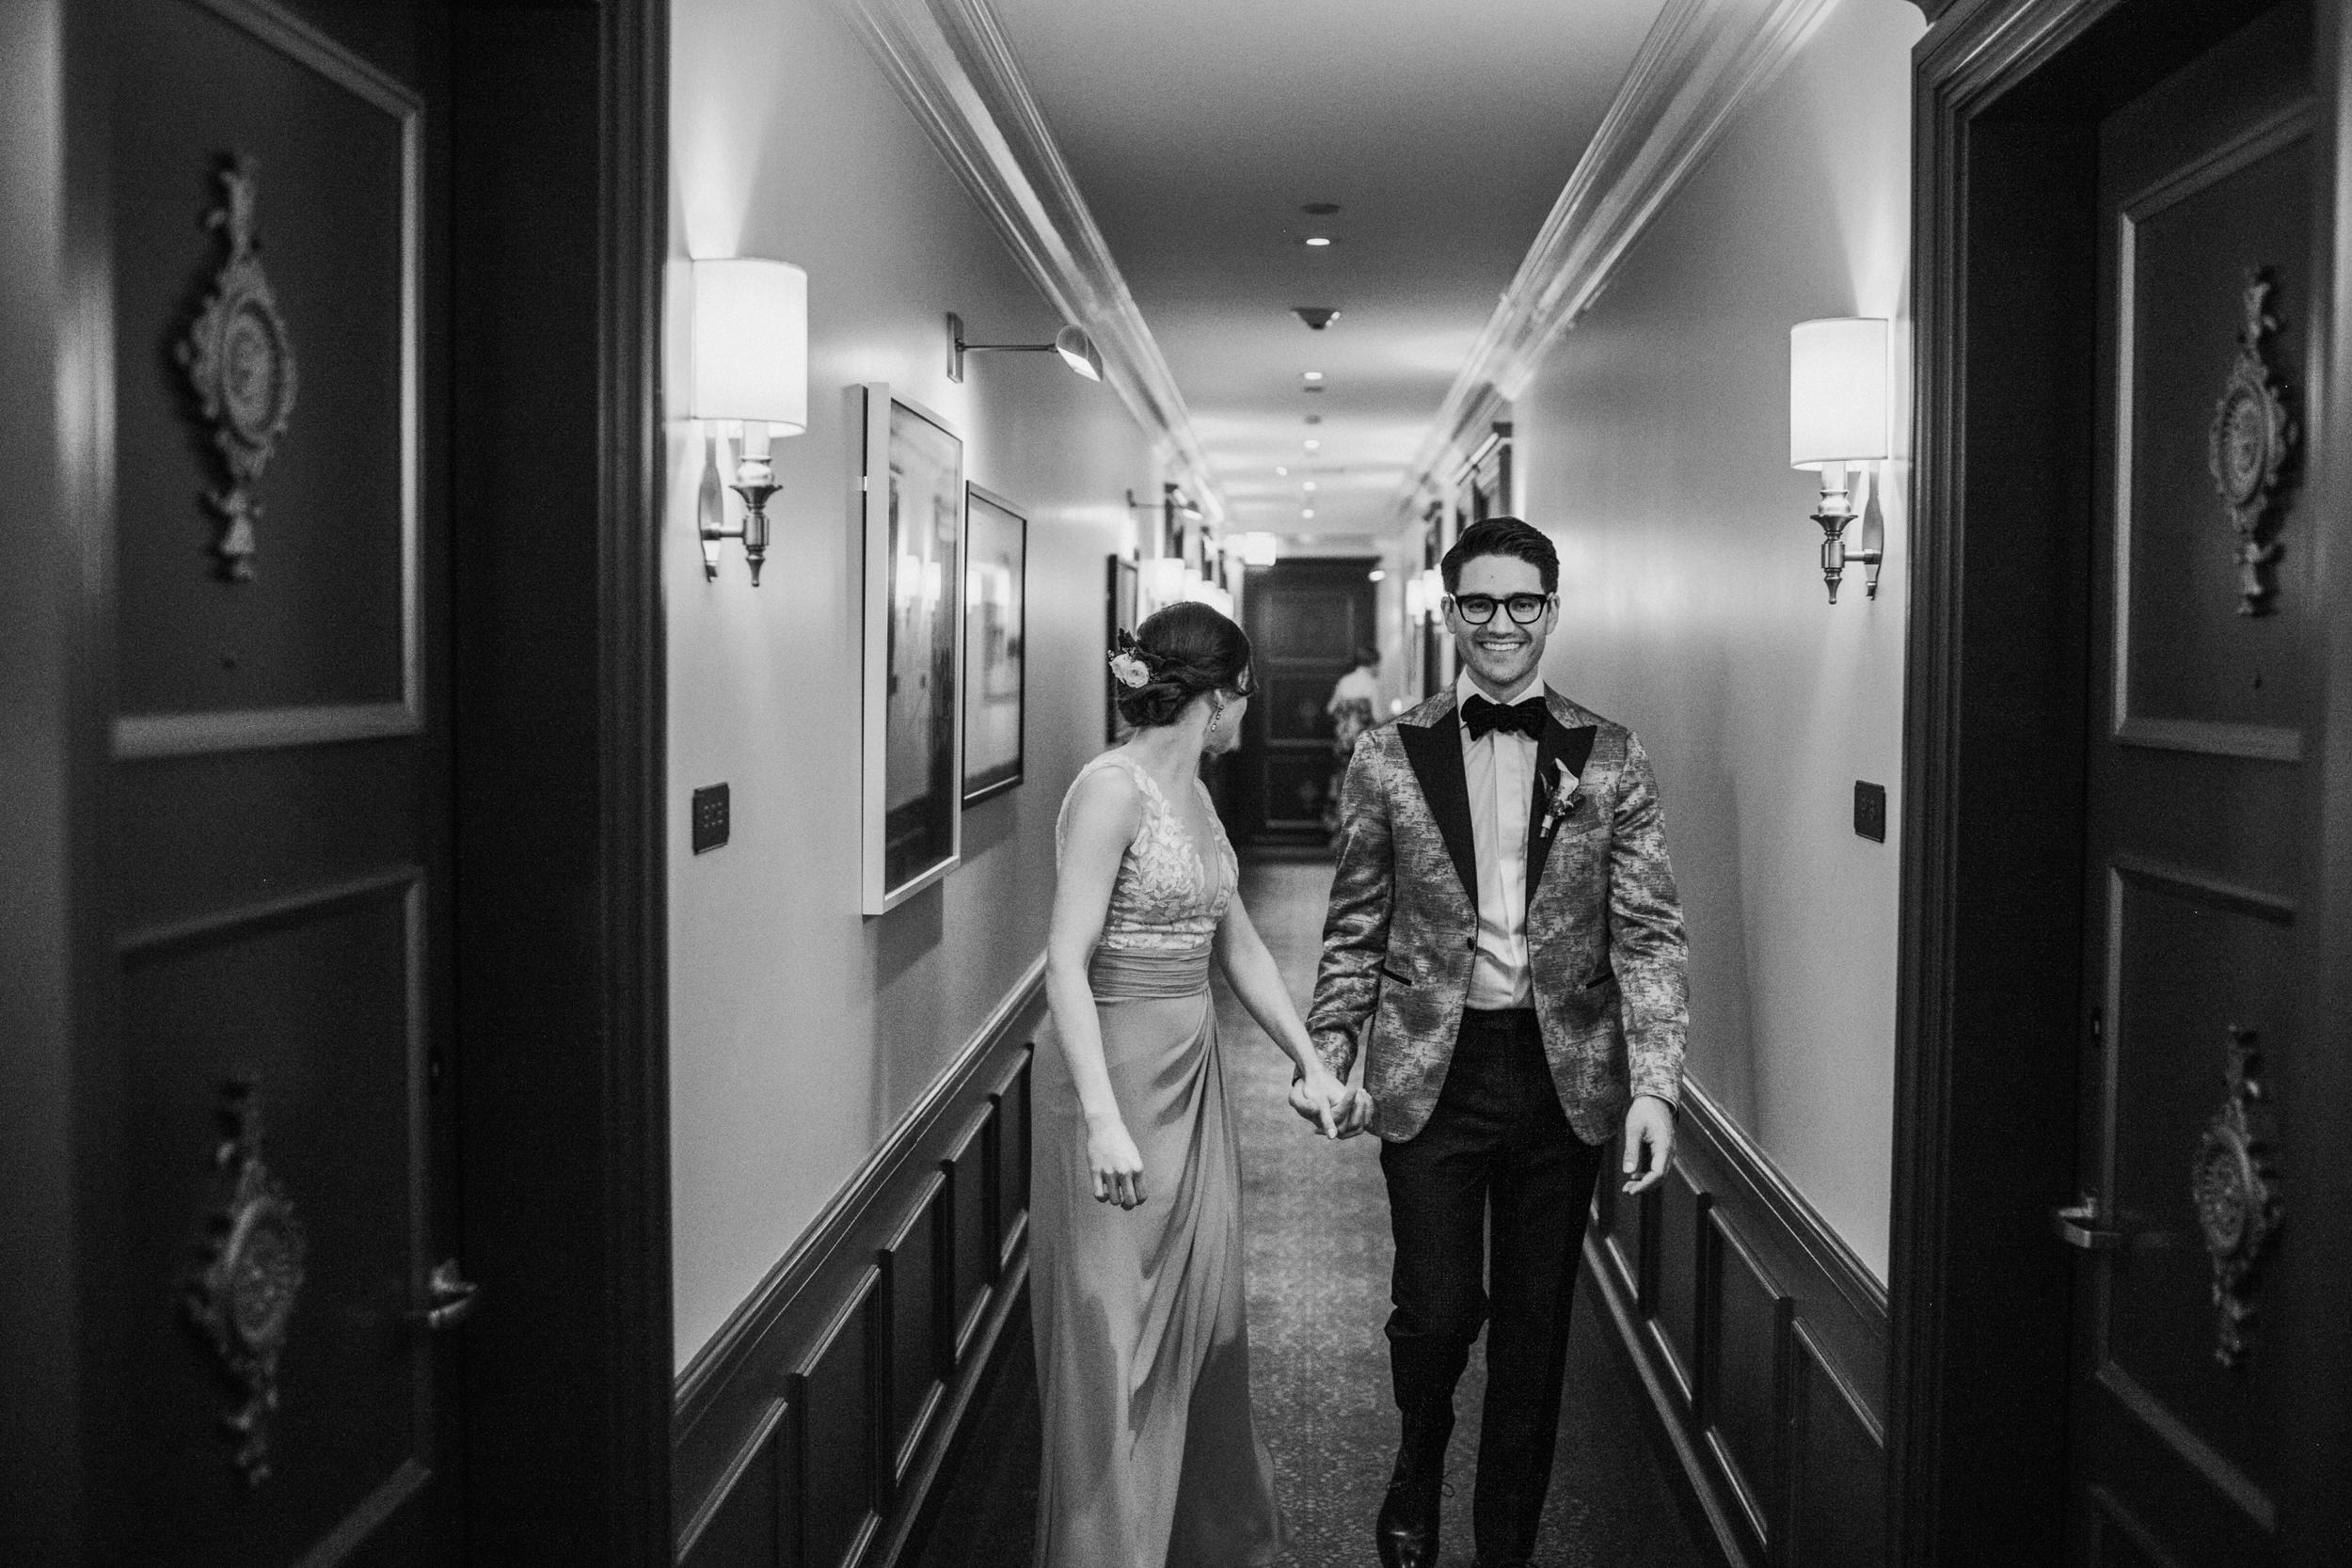 wedding_millwick_los_angeles-12.jpg